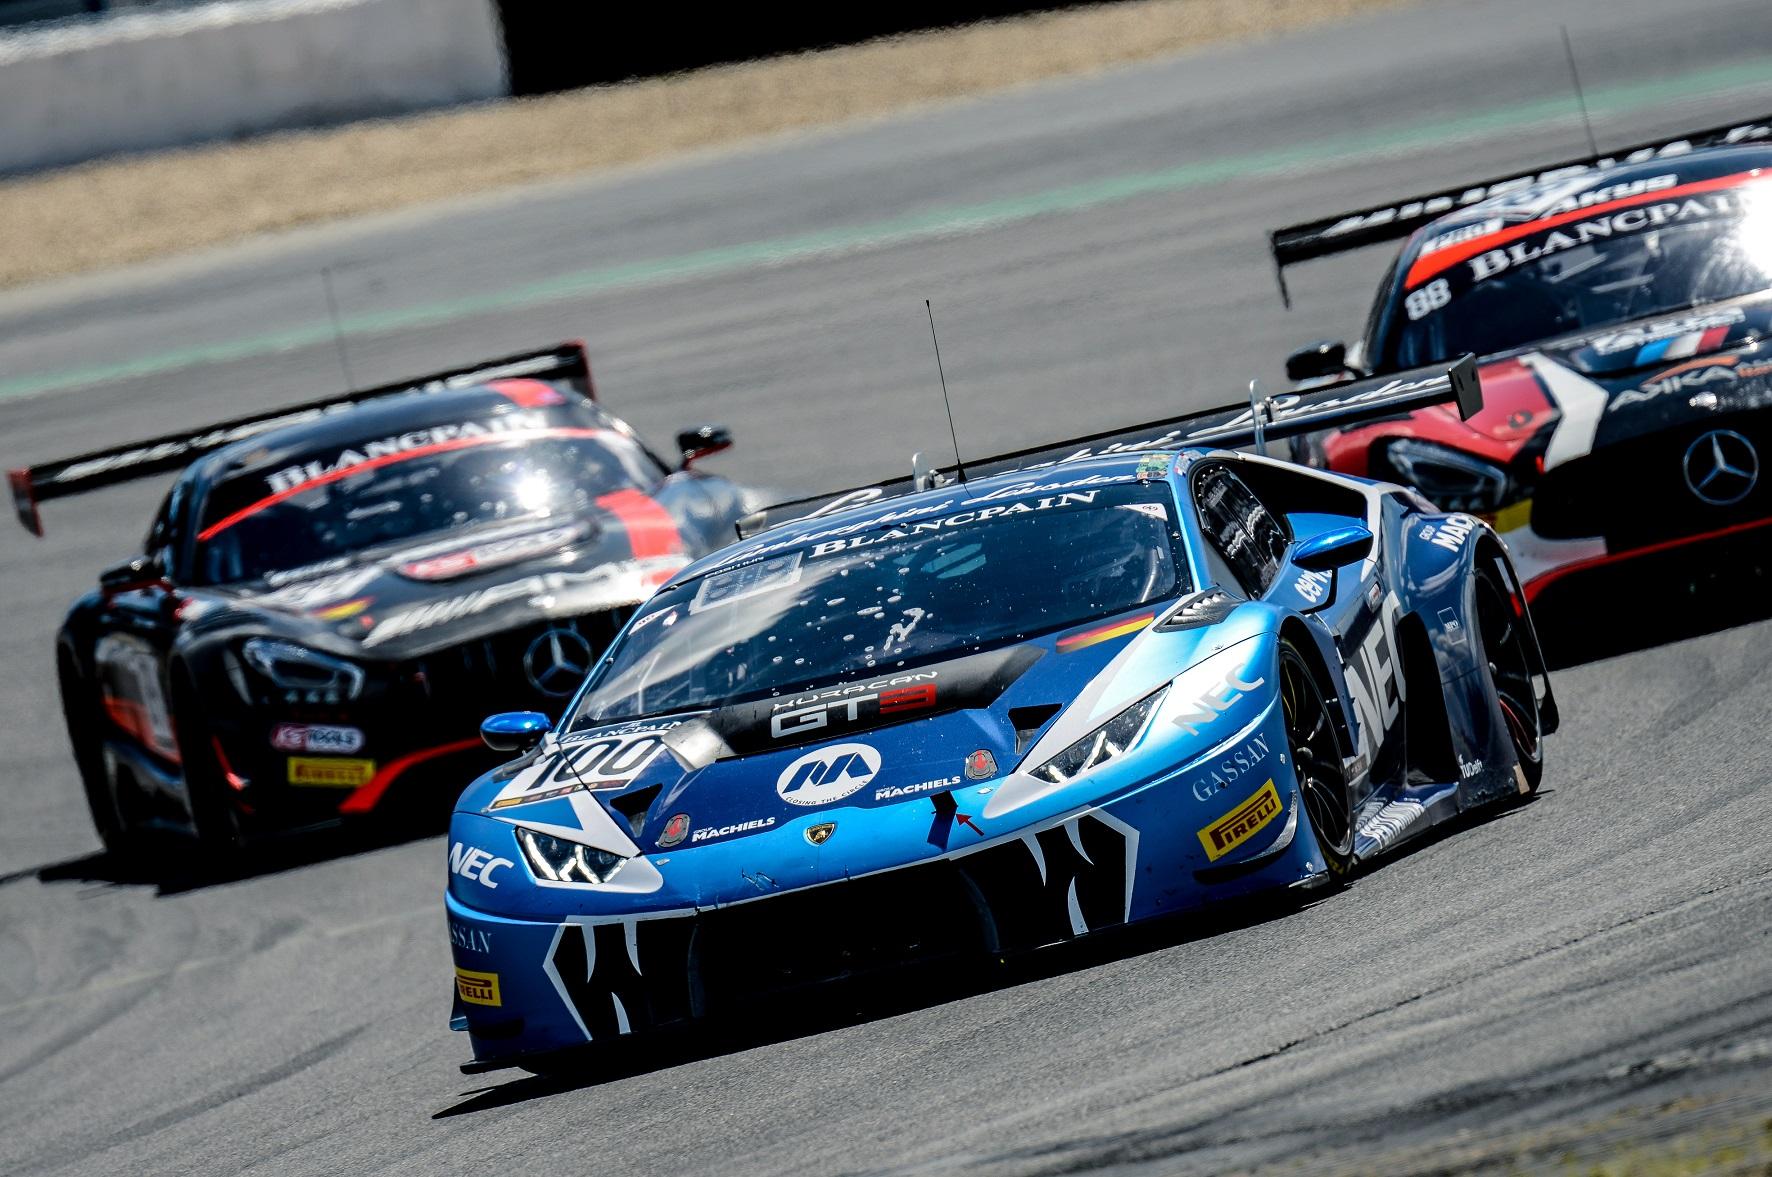 Lastige races op drukbezochte Nürburgring